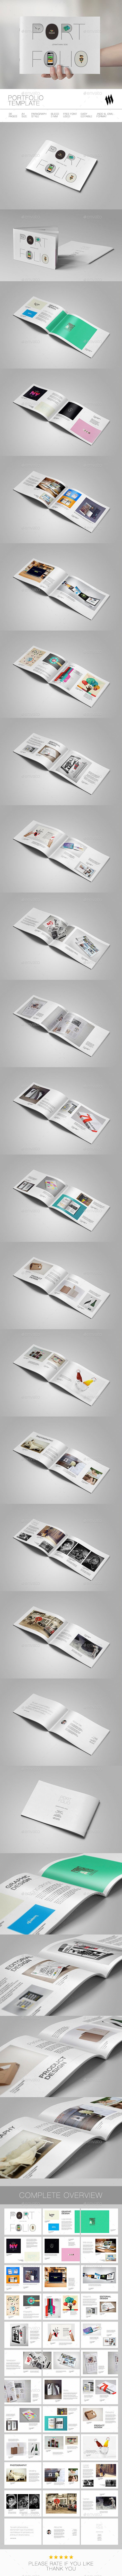 A4 Portfolio Brochure Template InDesign INDD #design Download: http://graphicriver.net/item/a4-portfolio-brochure/14058473?ref=ksioks